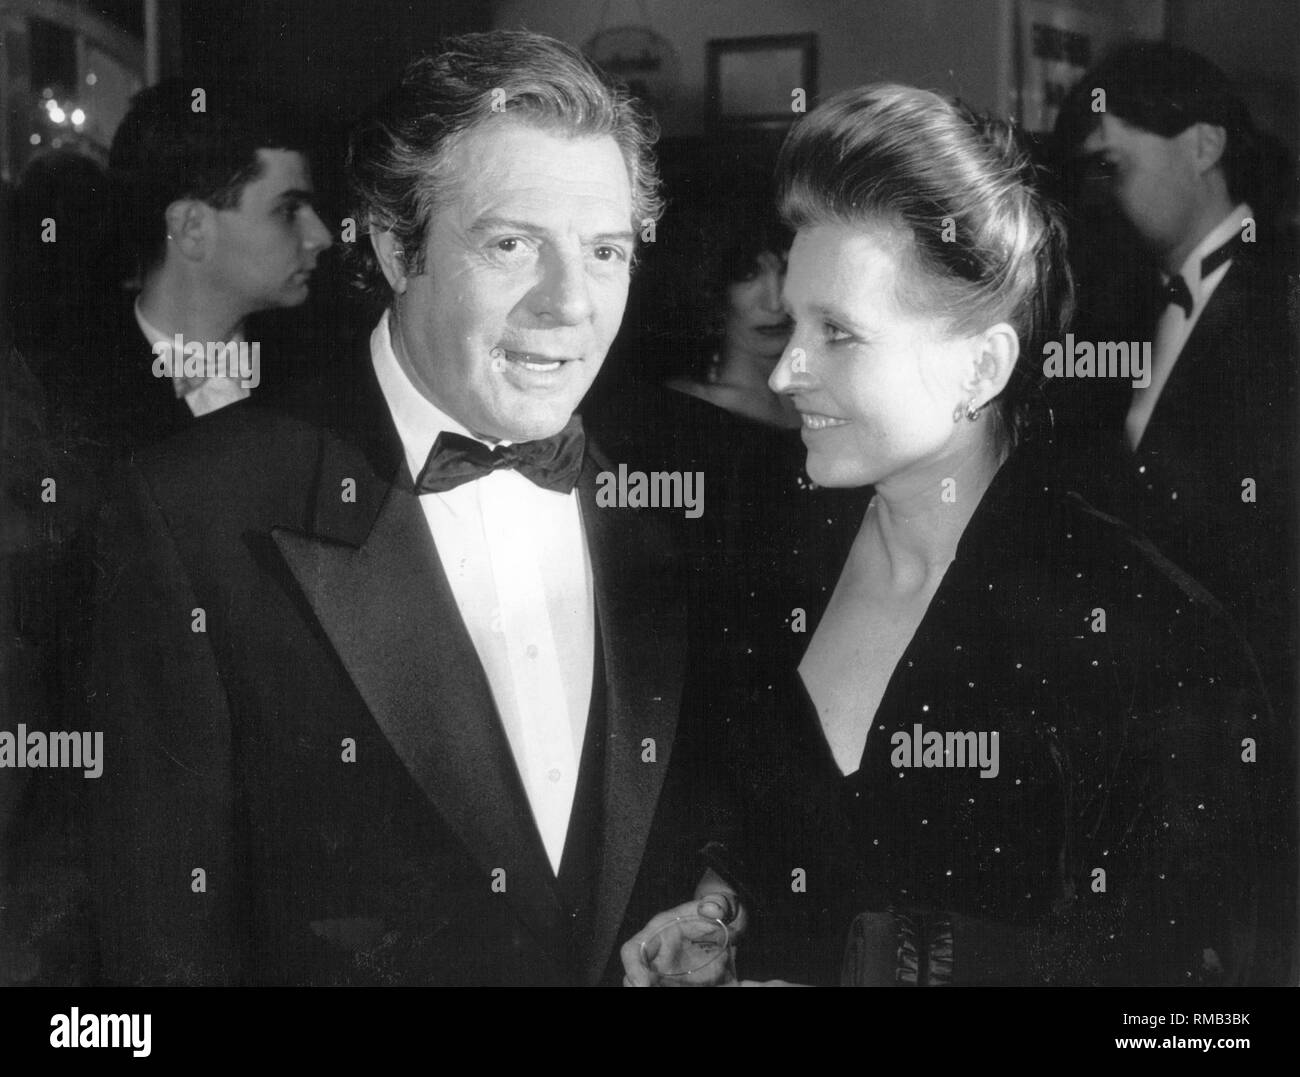 bbf3b46314 Marcello Mastroianni and Hanna Schygulla at the European Film Awards  ceremony. - Stock Image